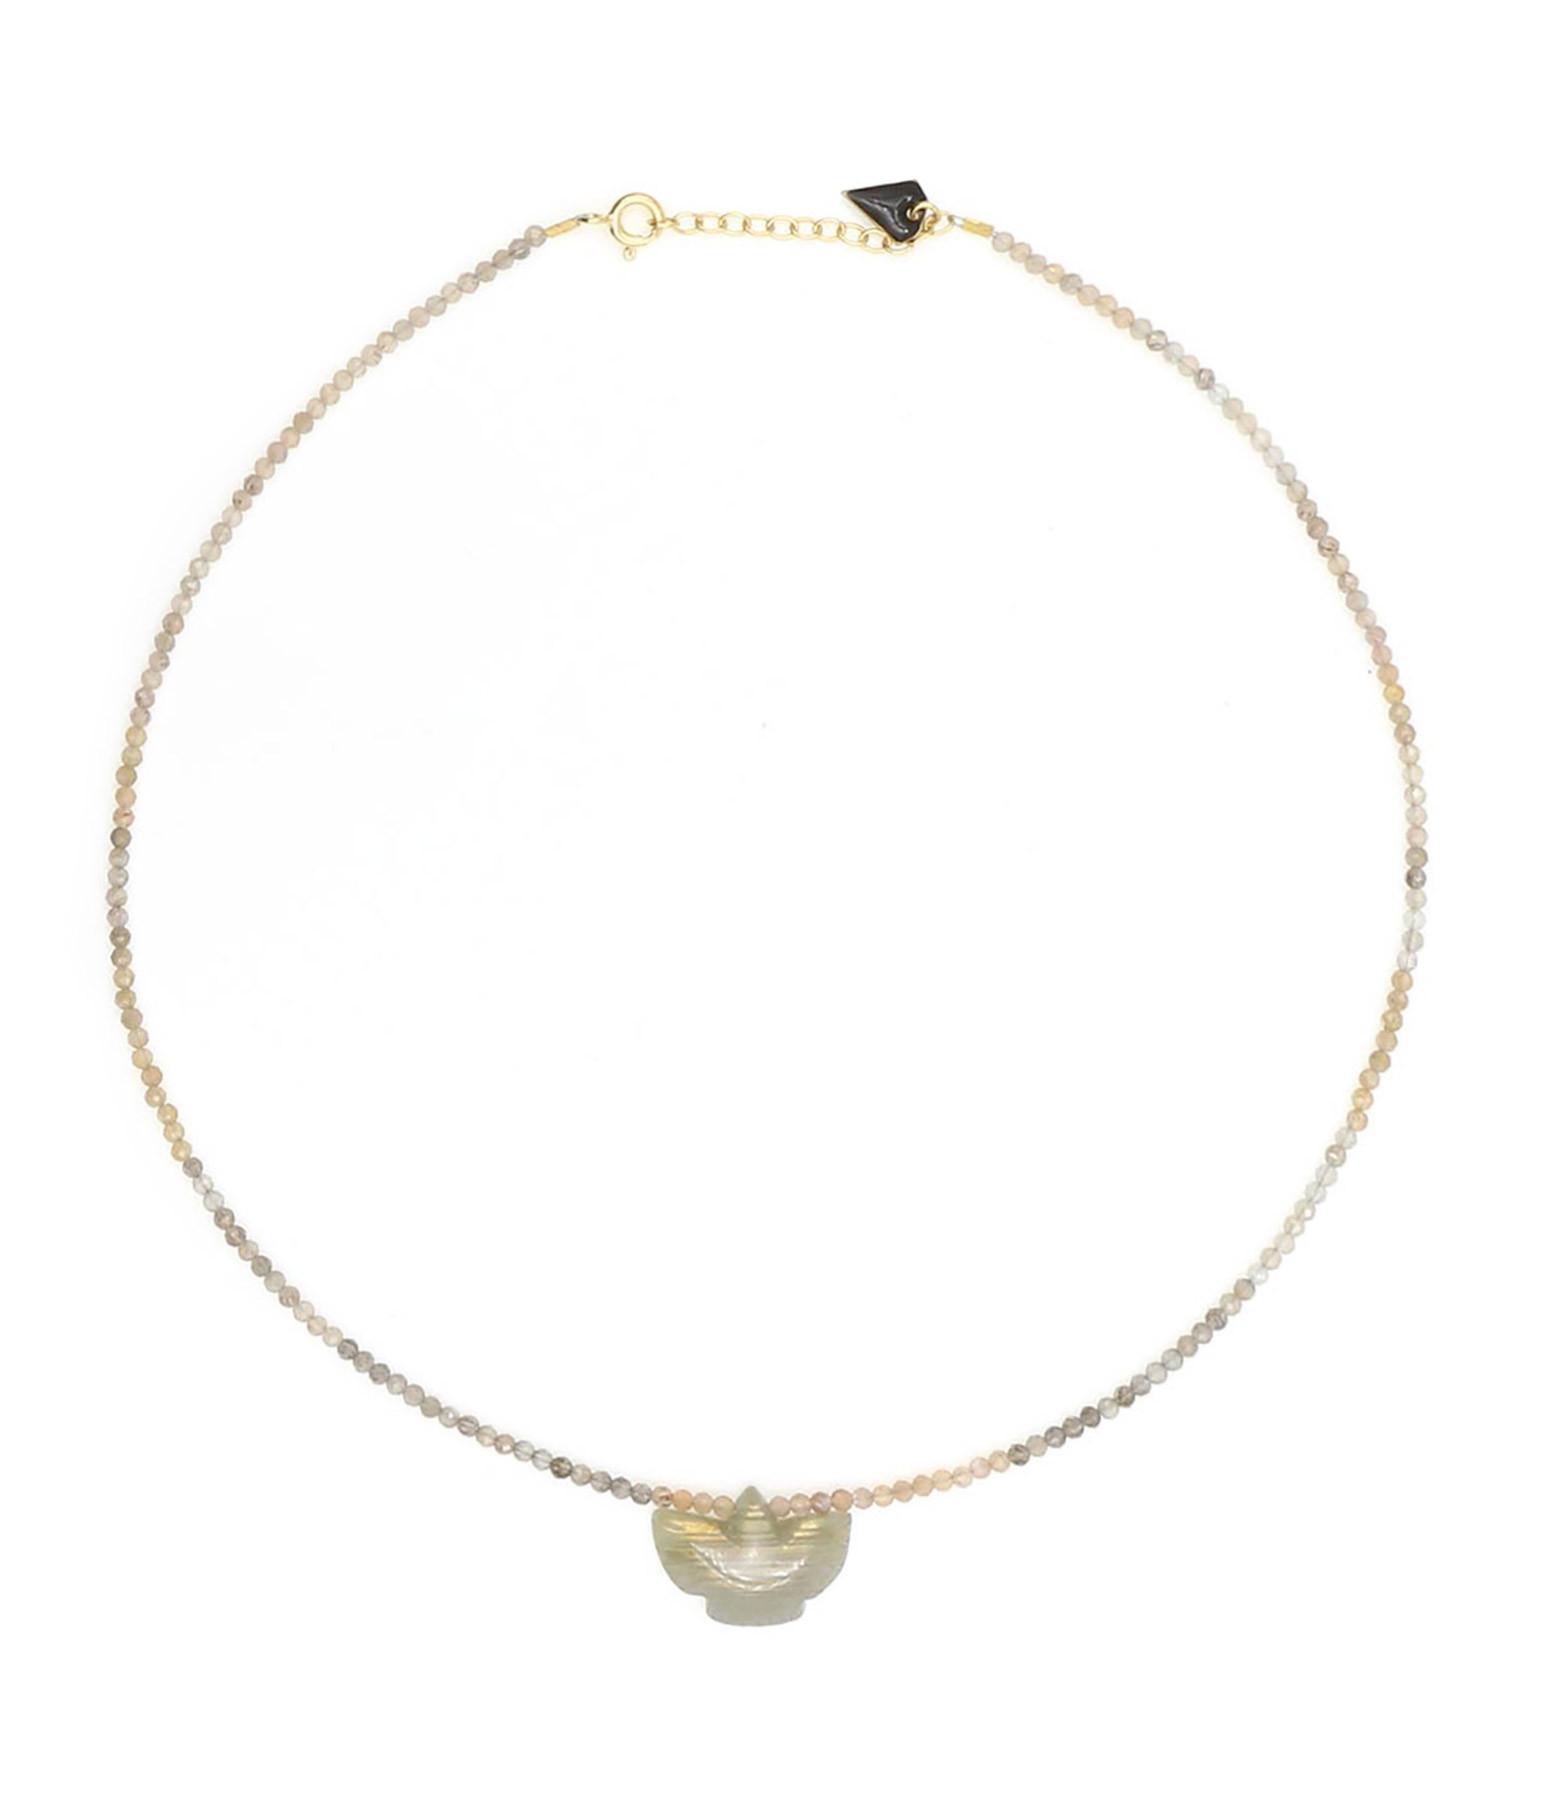 MON PRECIEUX GEM - Collier Condor Perles Labradorite